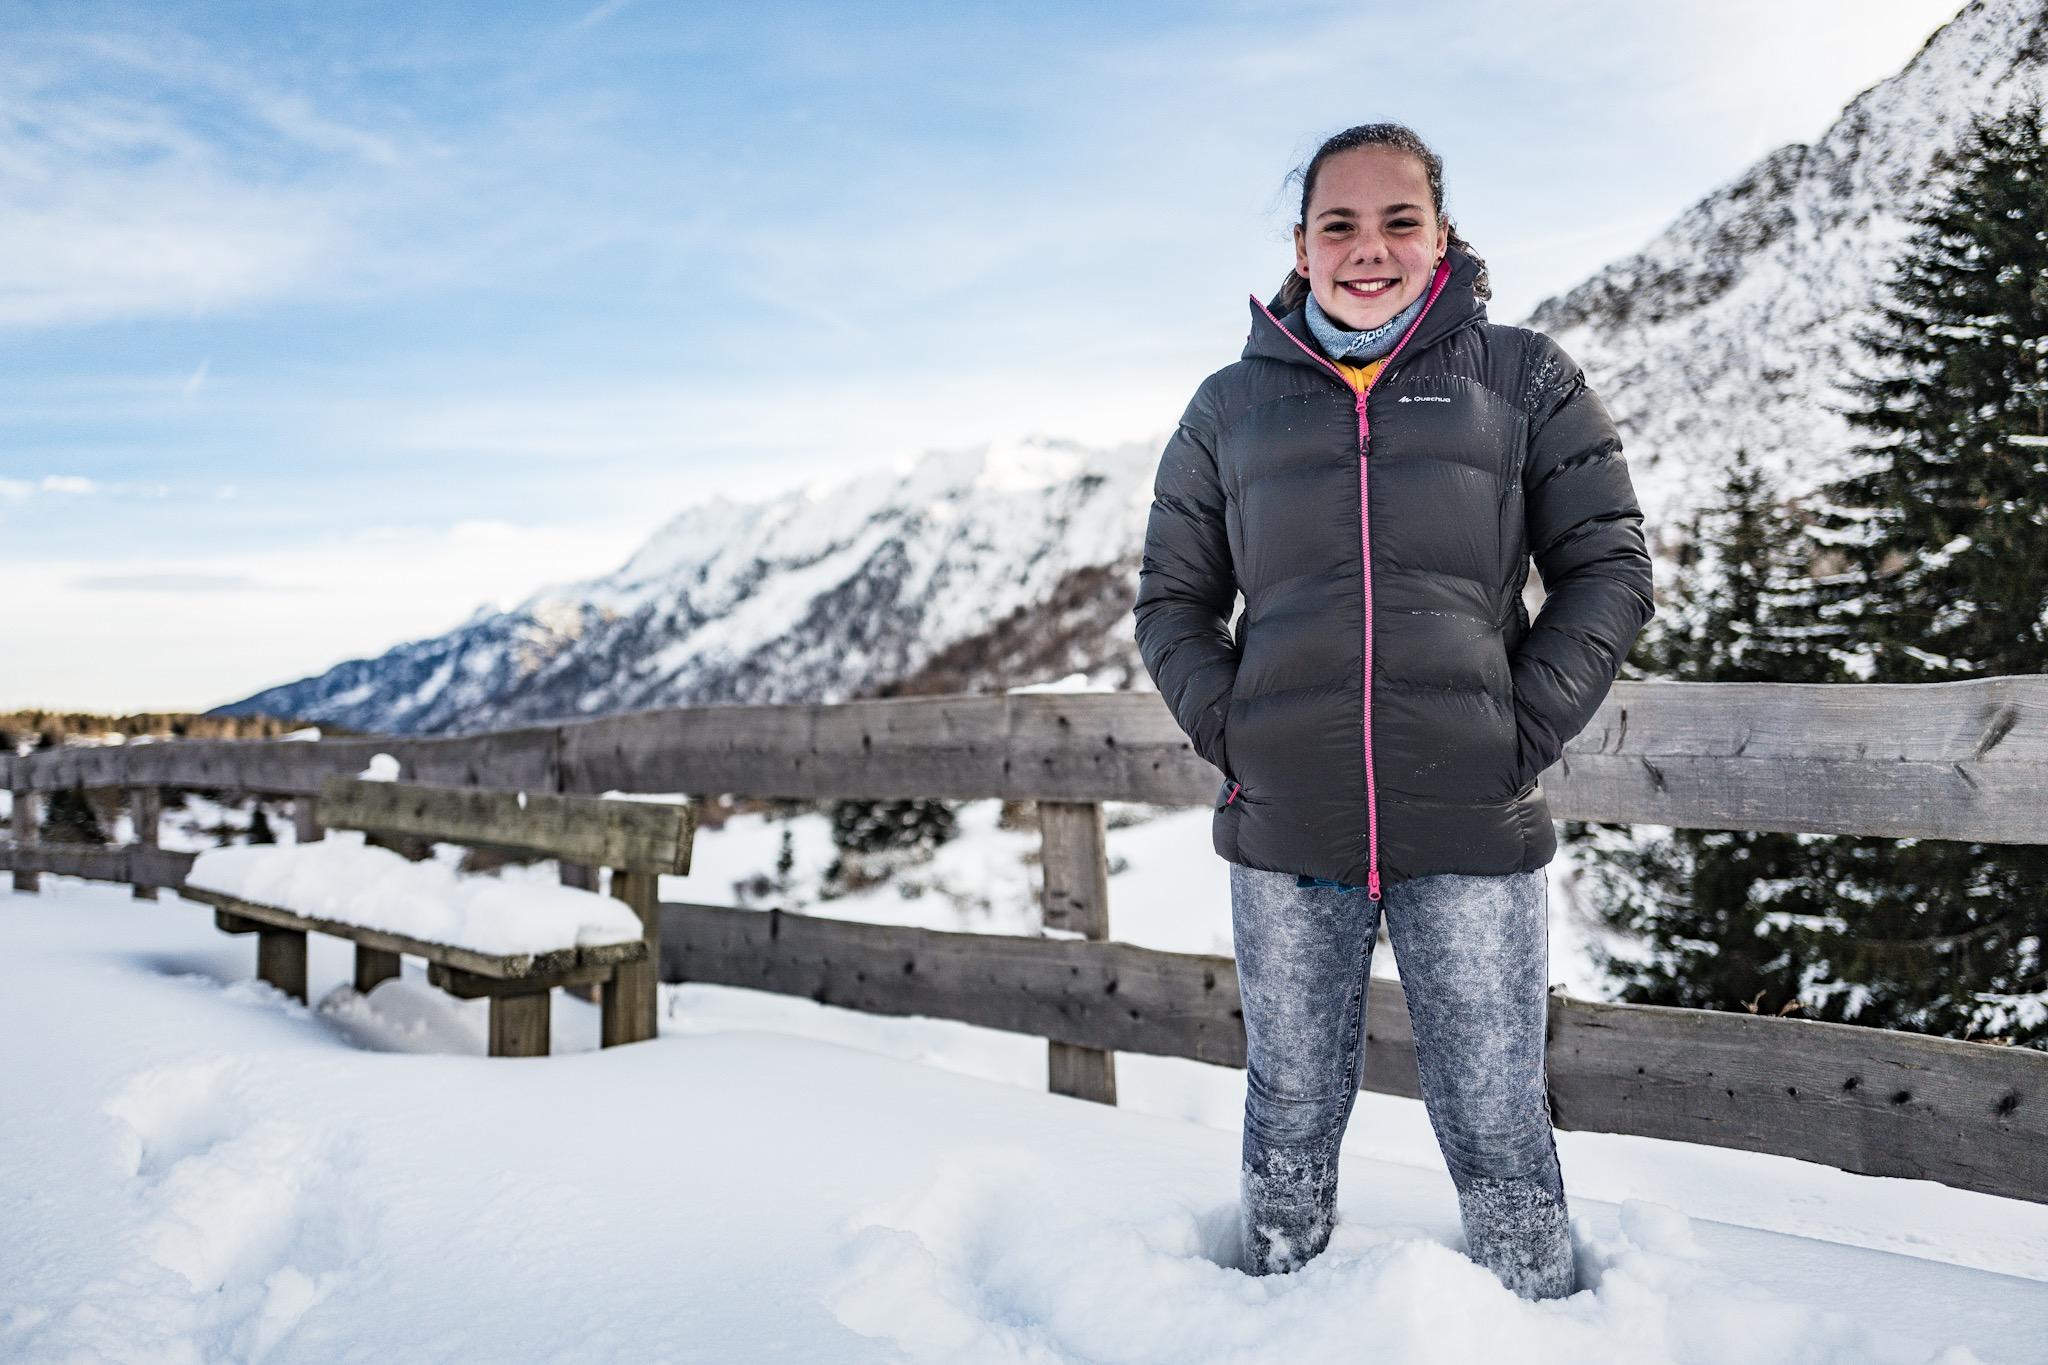 She's pretty happy in knee deep powder snow.